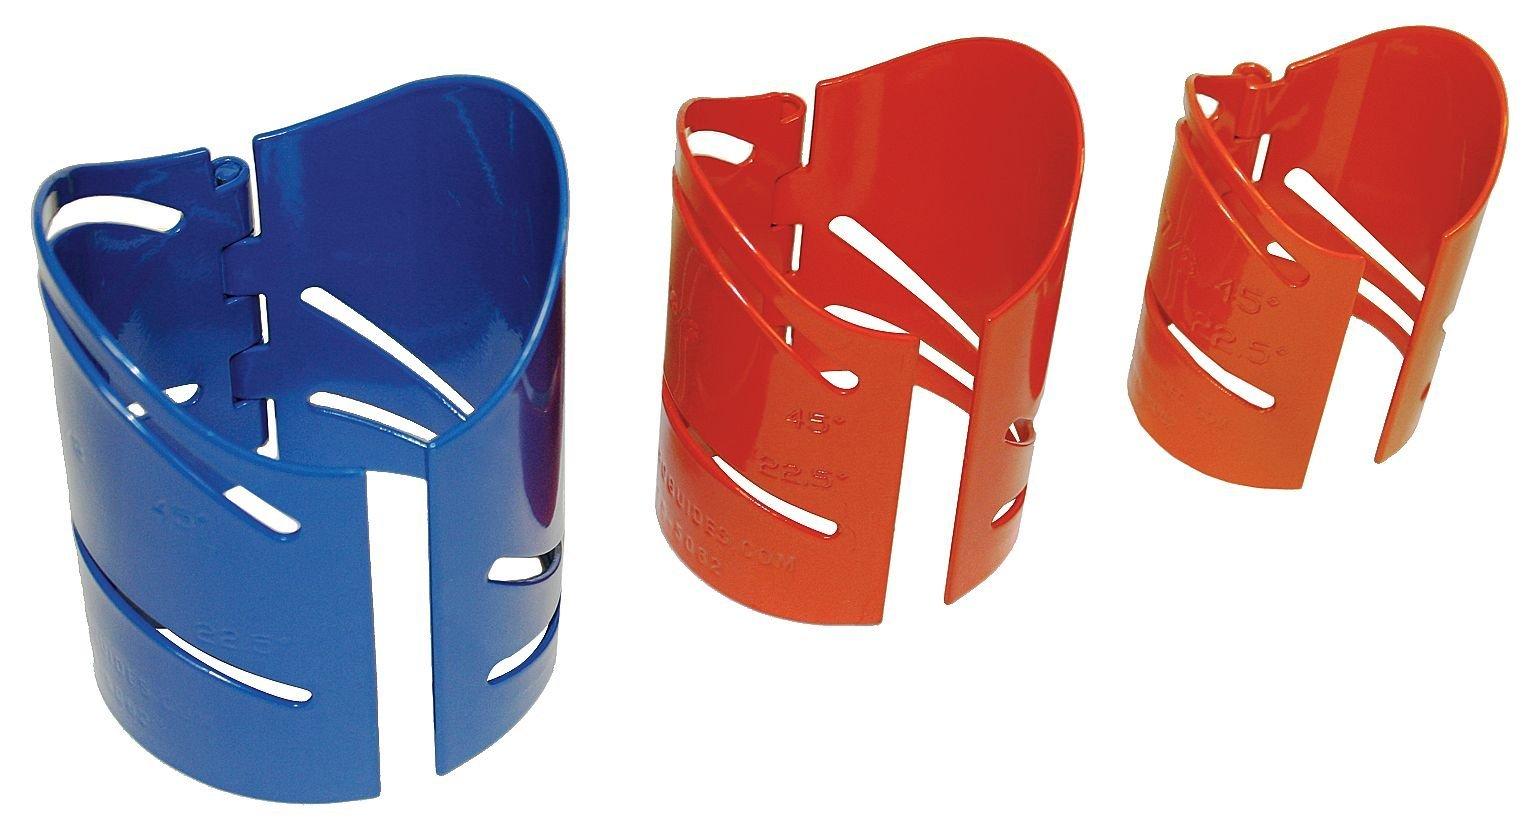 Pipe-Pro - MEKIT Metal Cutting Guide Set, Steel by Pipe-Pro